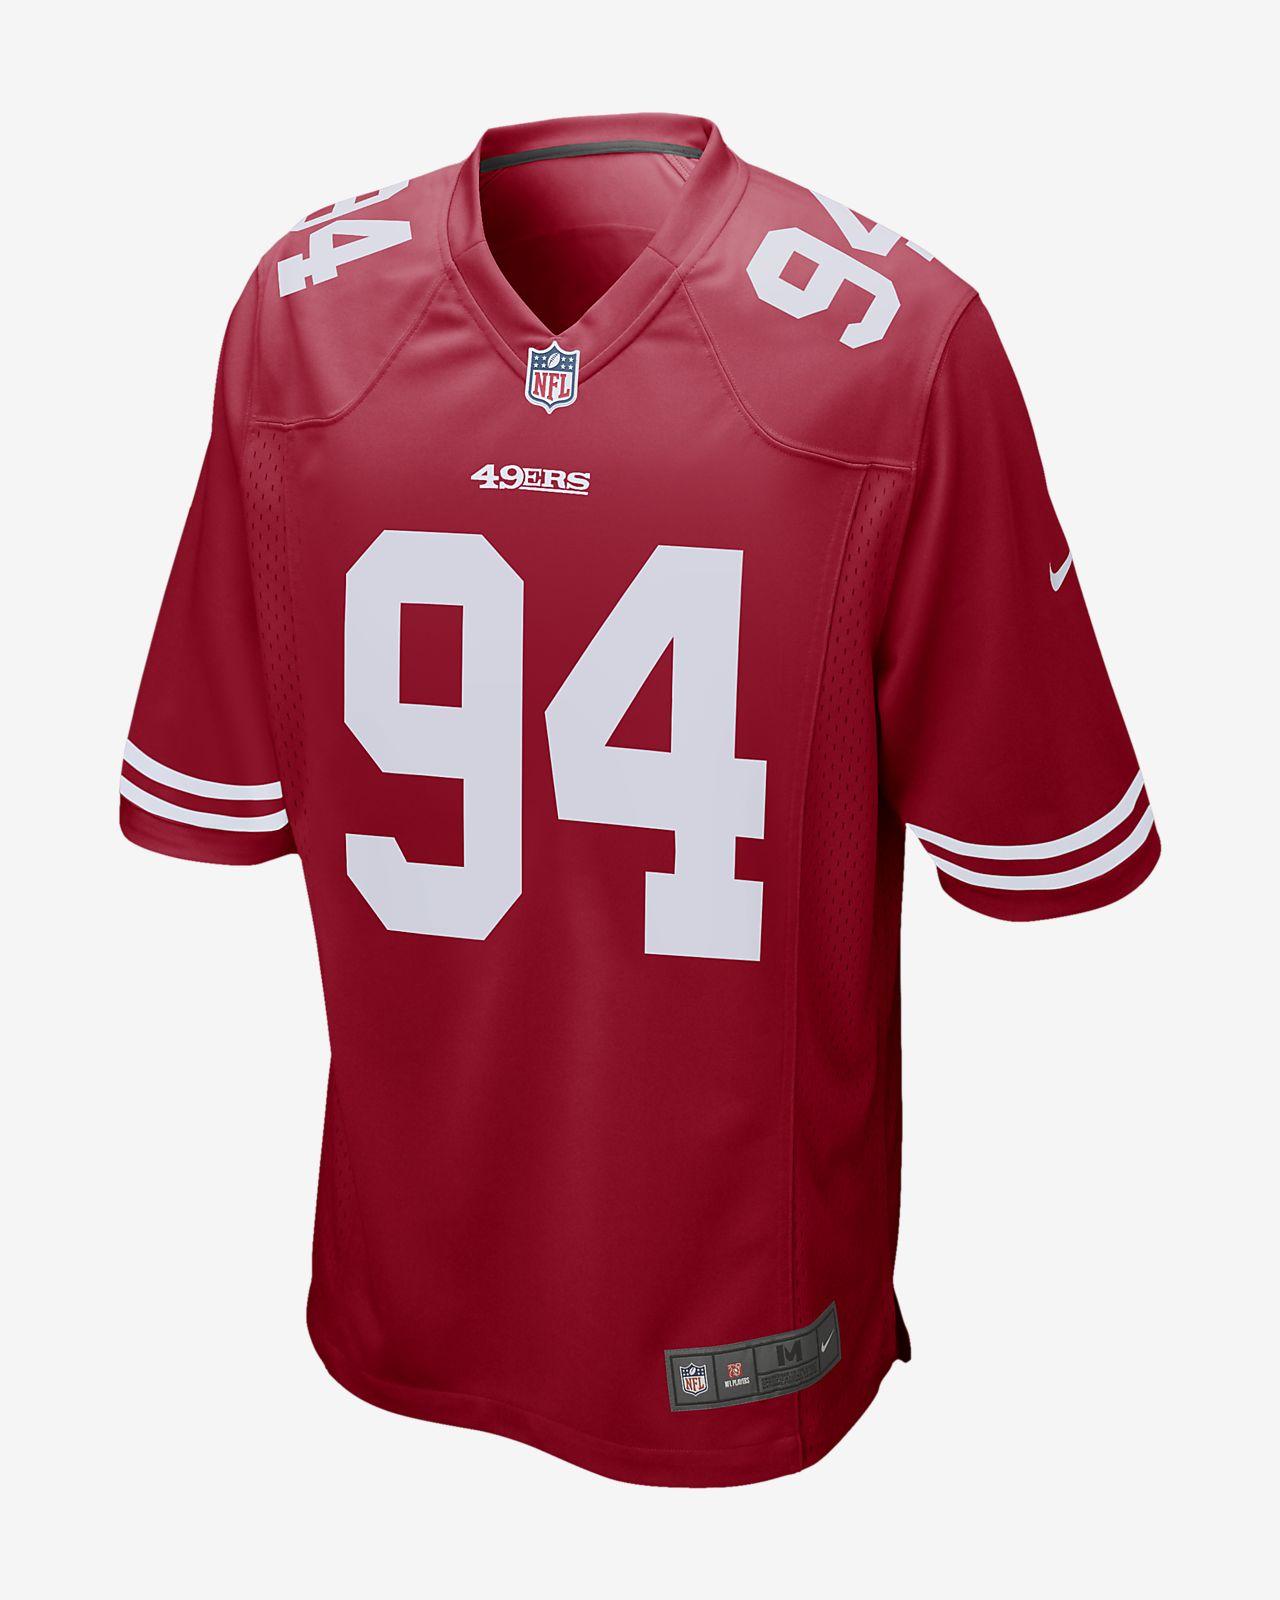 3e5b2a124cdf6 ... Camiseta de fútbol americano para hombre NFL San Francisco 49ers Game  (Solomon Thomas)